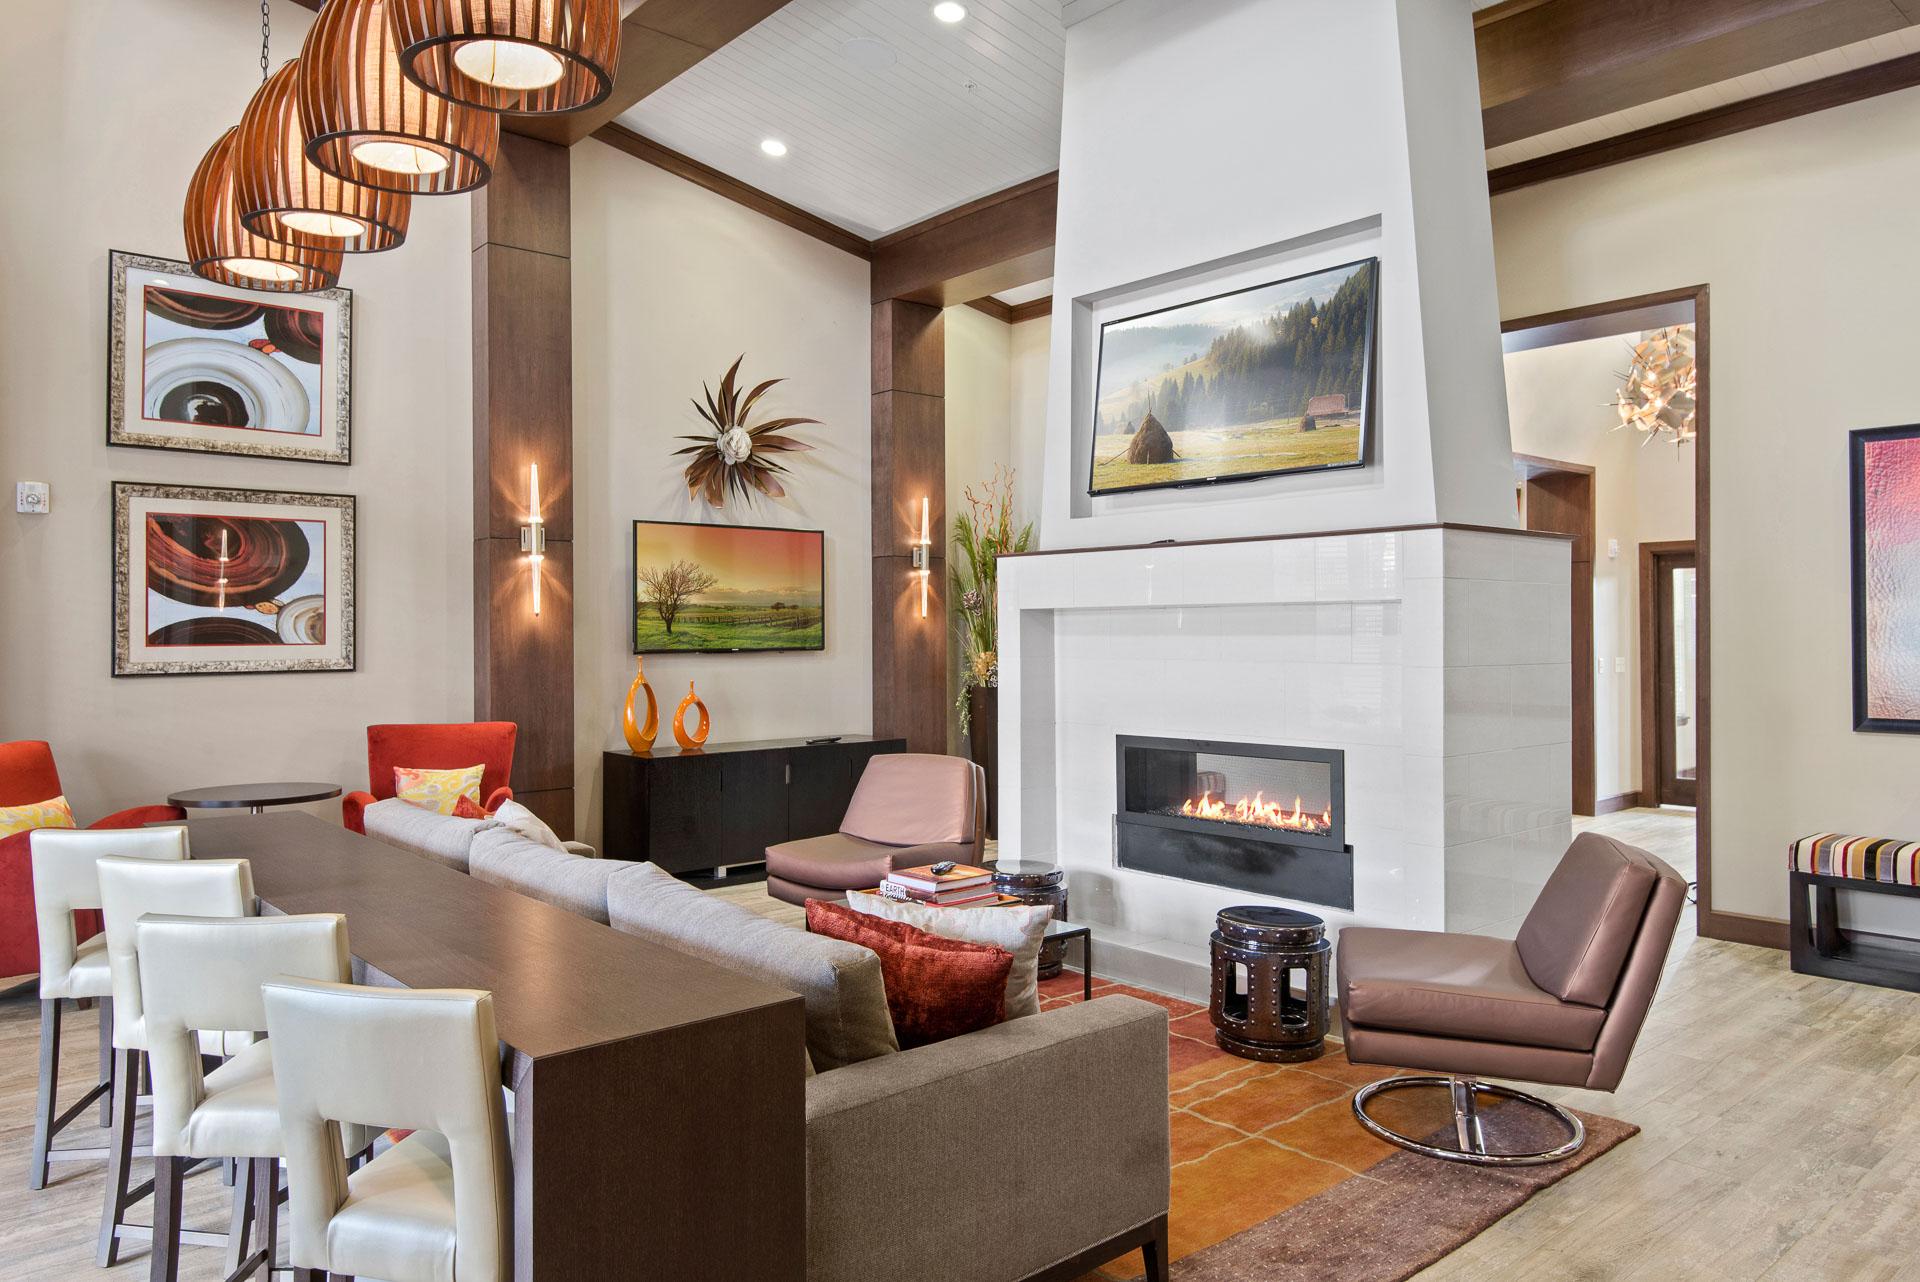 Sherpa Media Kansas City - Apartments & Multi-Family Housing - 01